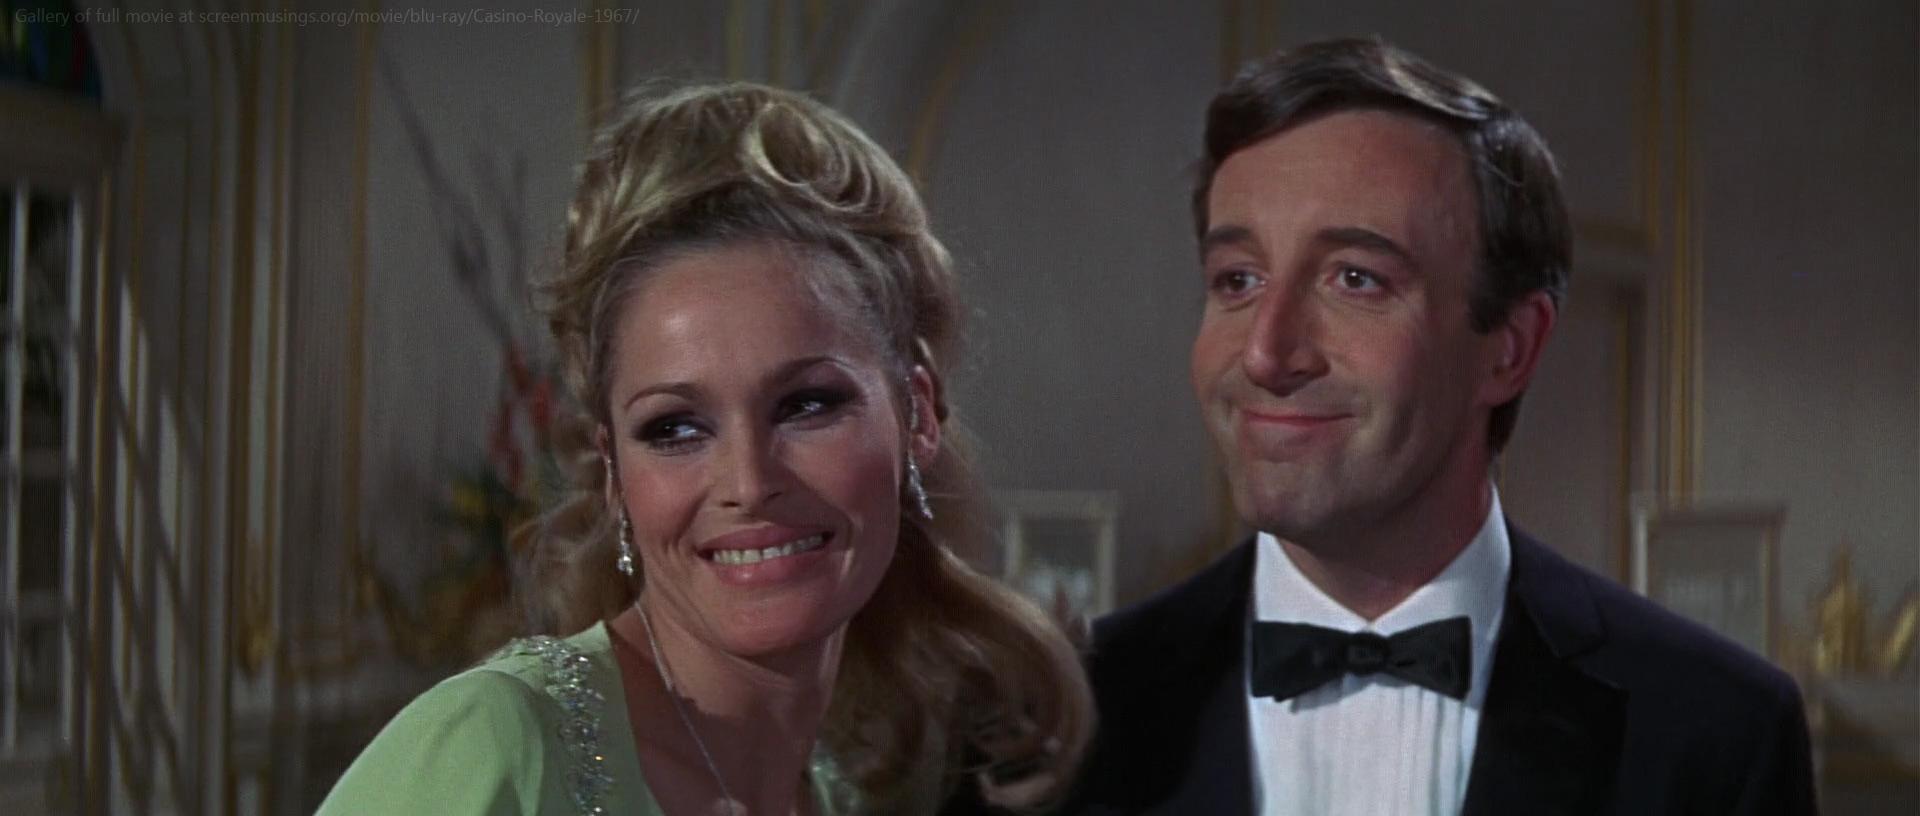 007 casino royale 1967